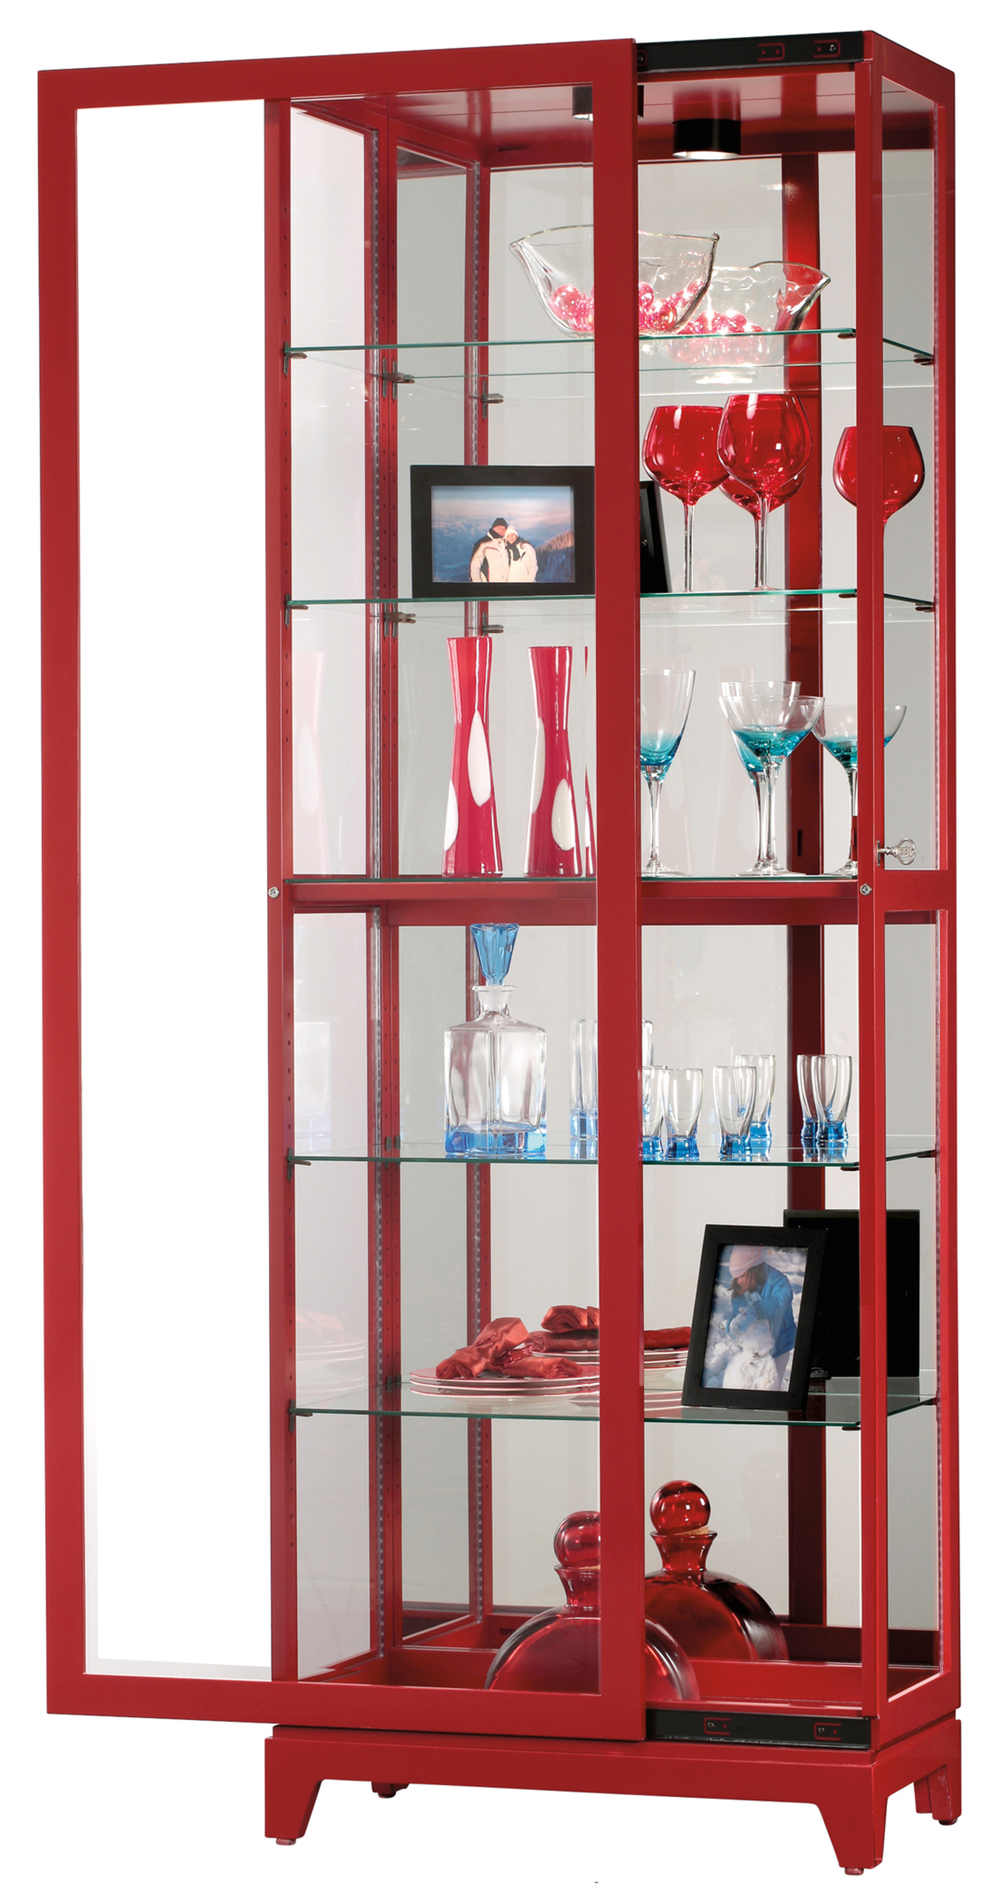 Howard Miller Clock - Luke V Curio Cabinet